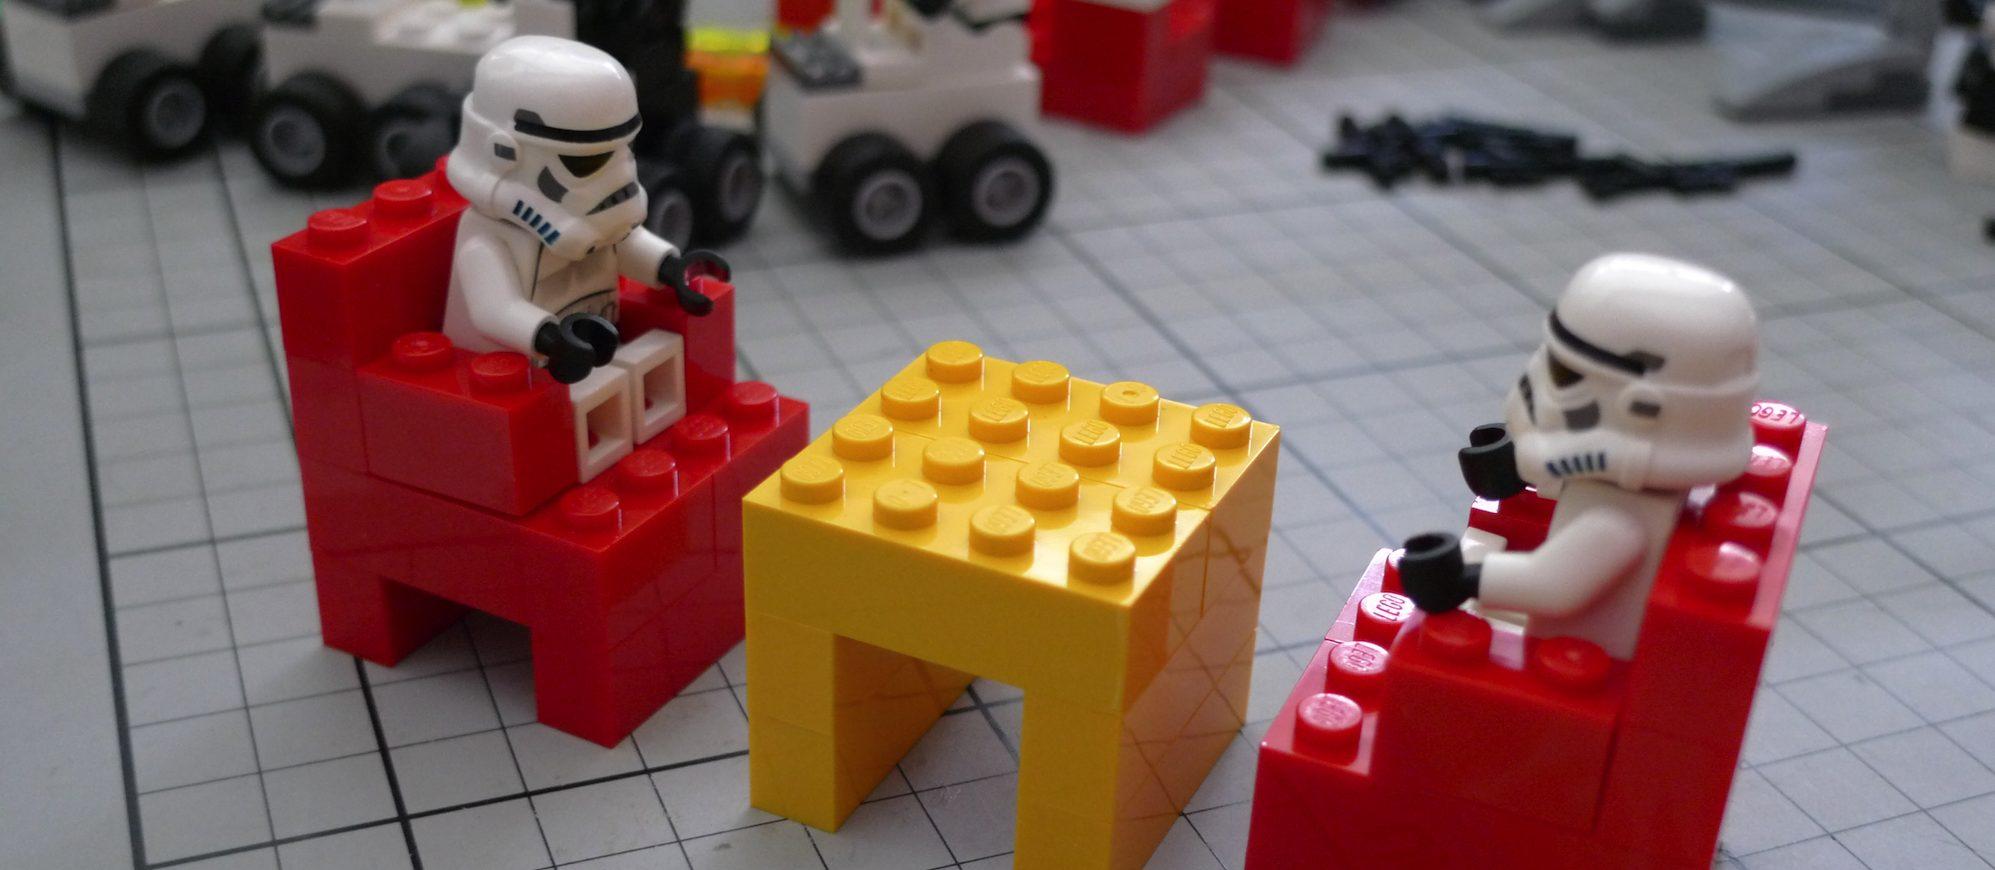 Lego Conversations